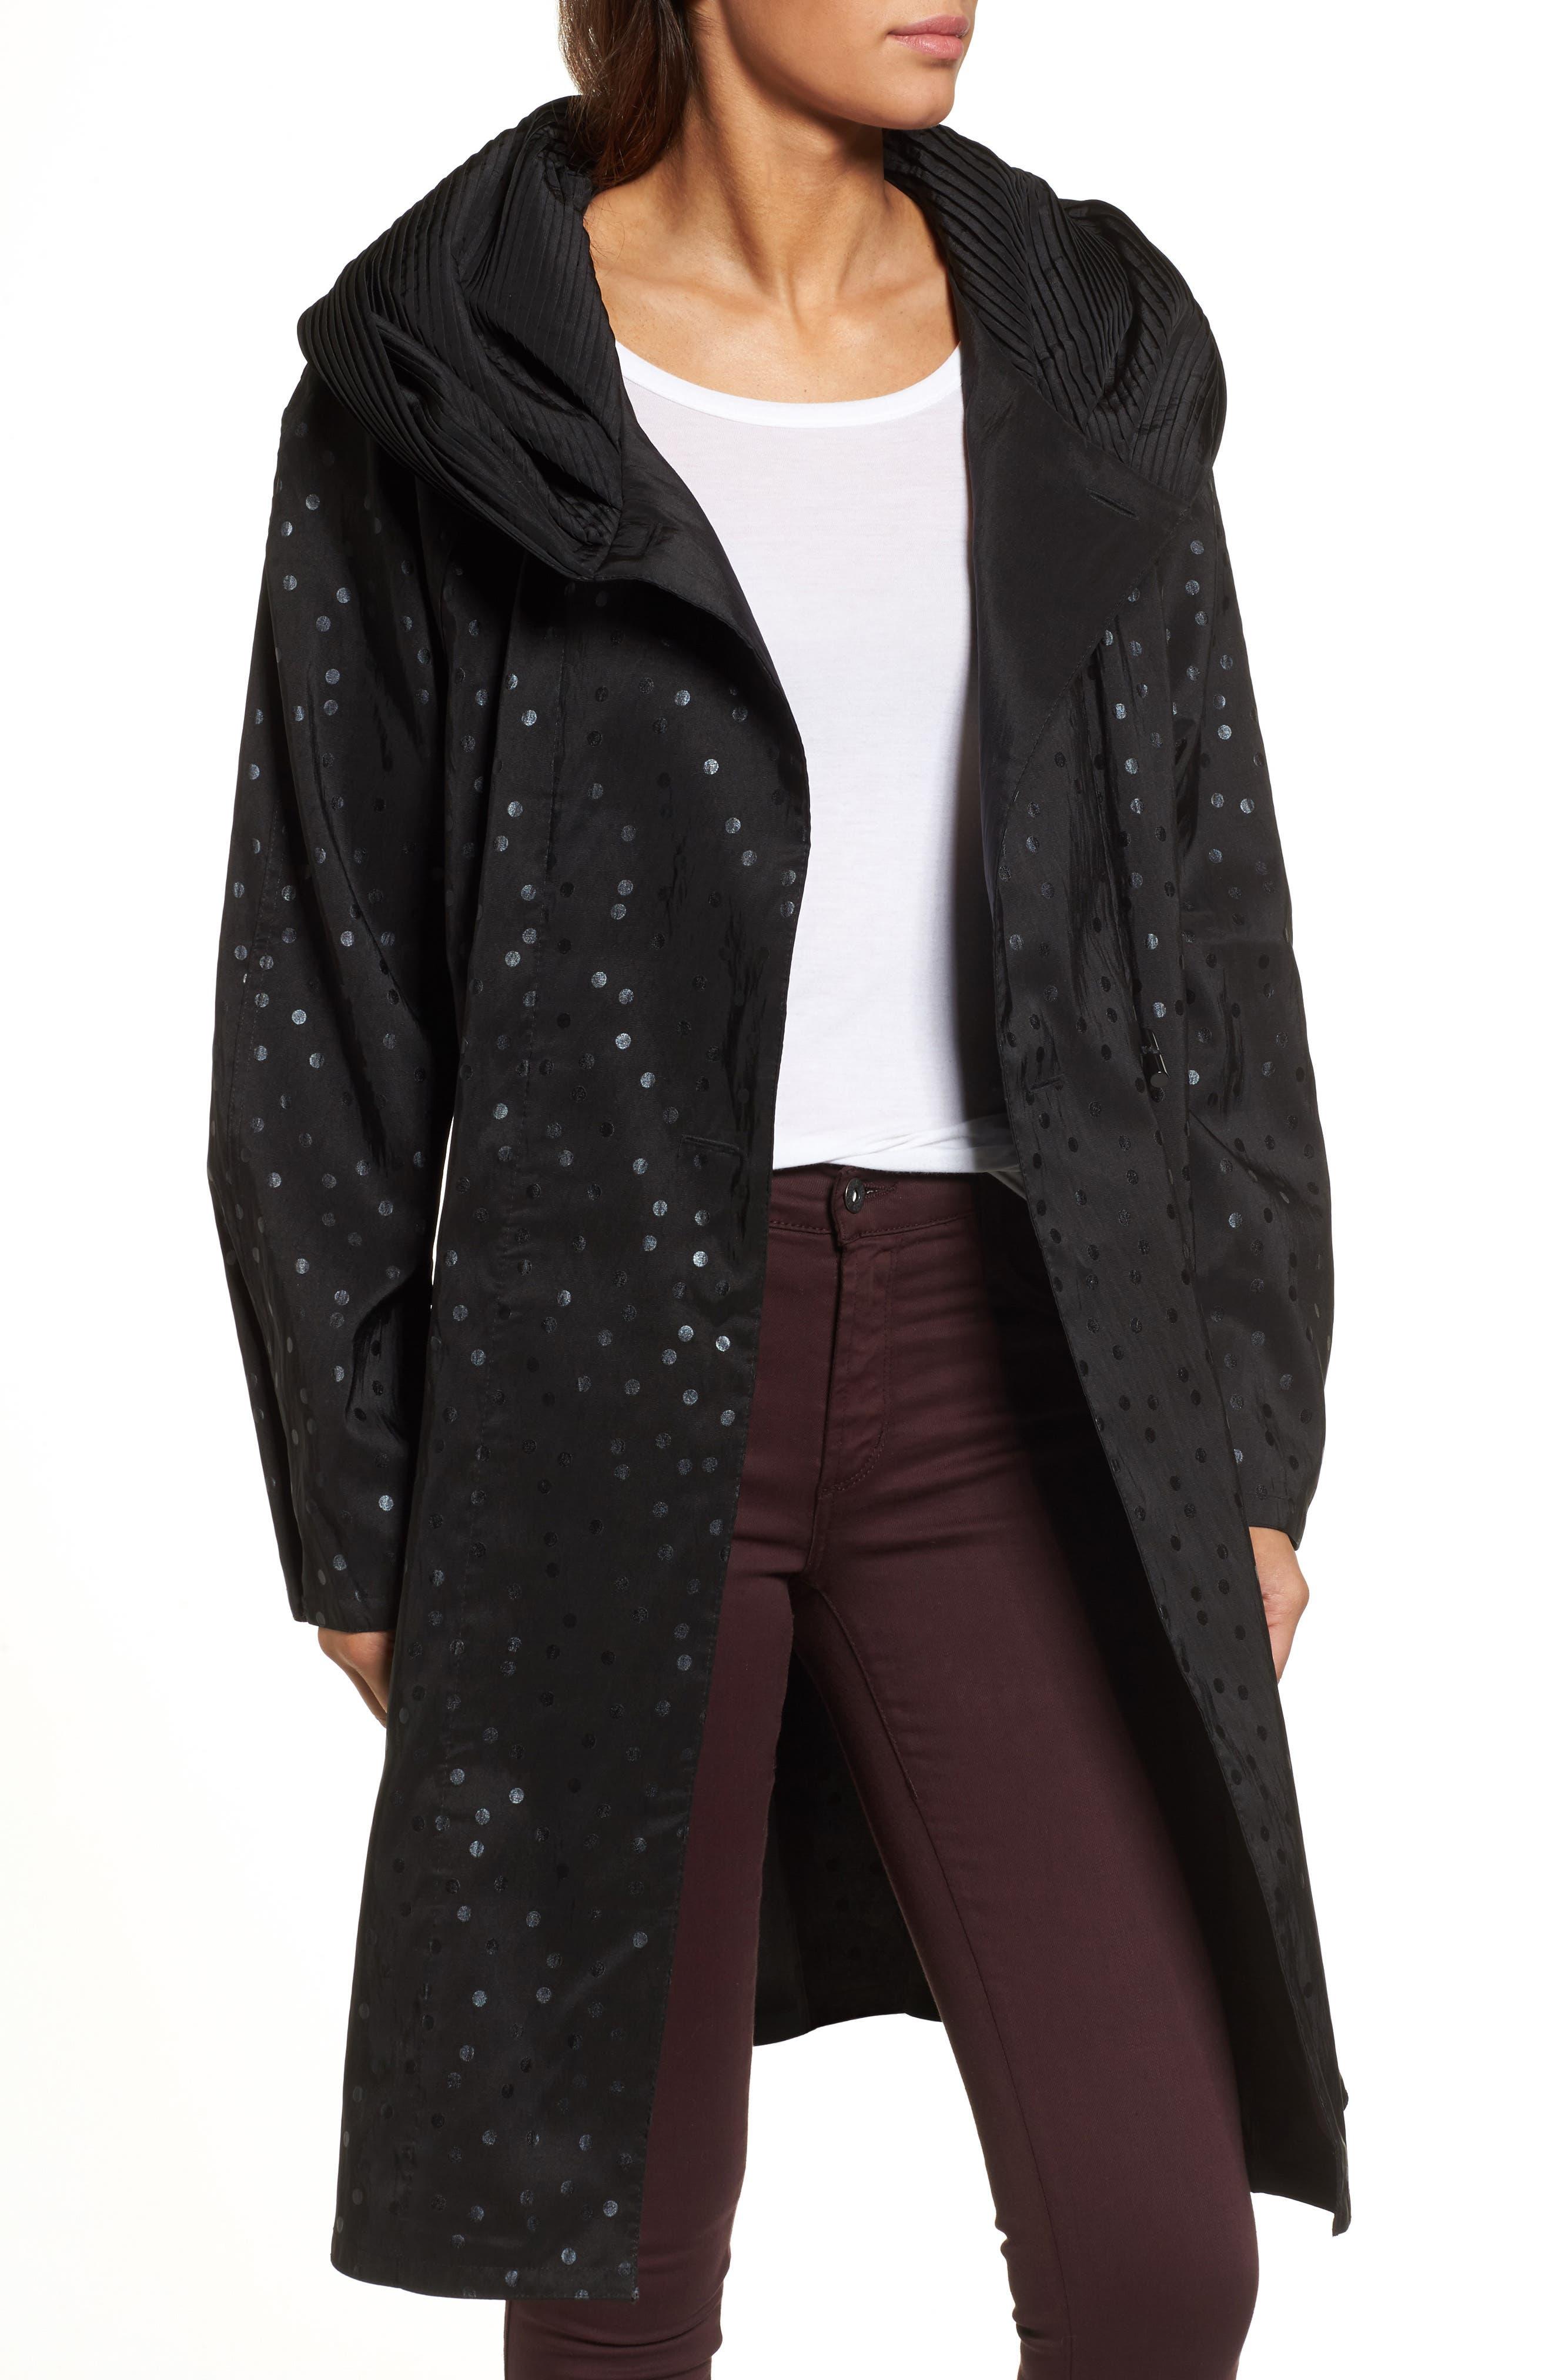 Mycra Pac Designer Wear 'Donatella' Reversible Dot Pleat Hood Packable Travel Coat